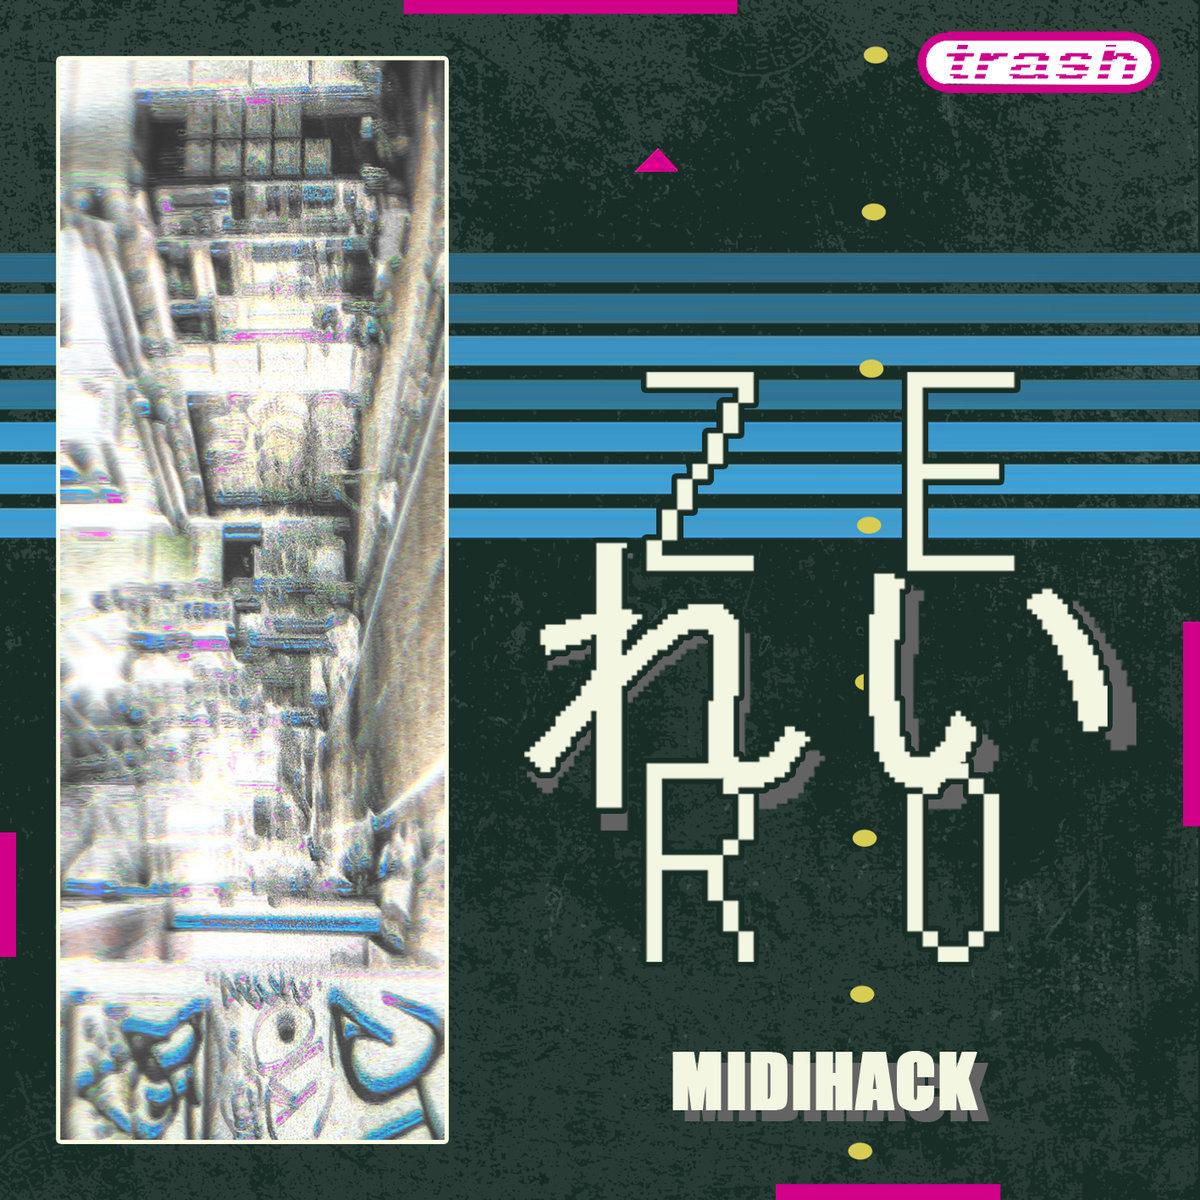 MIDIHACK by Zer0 れい (CD) 1